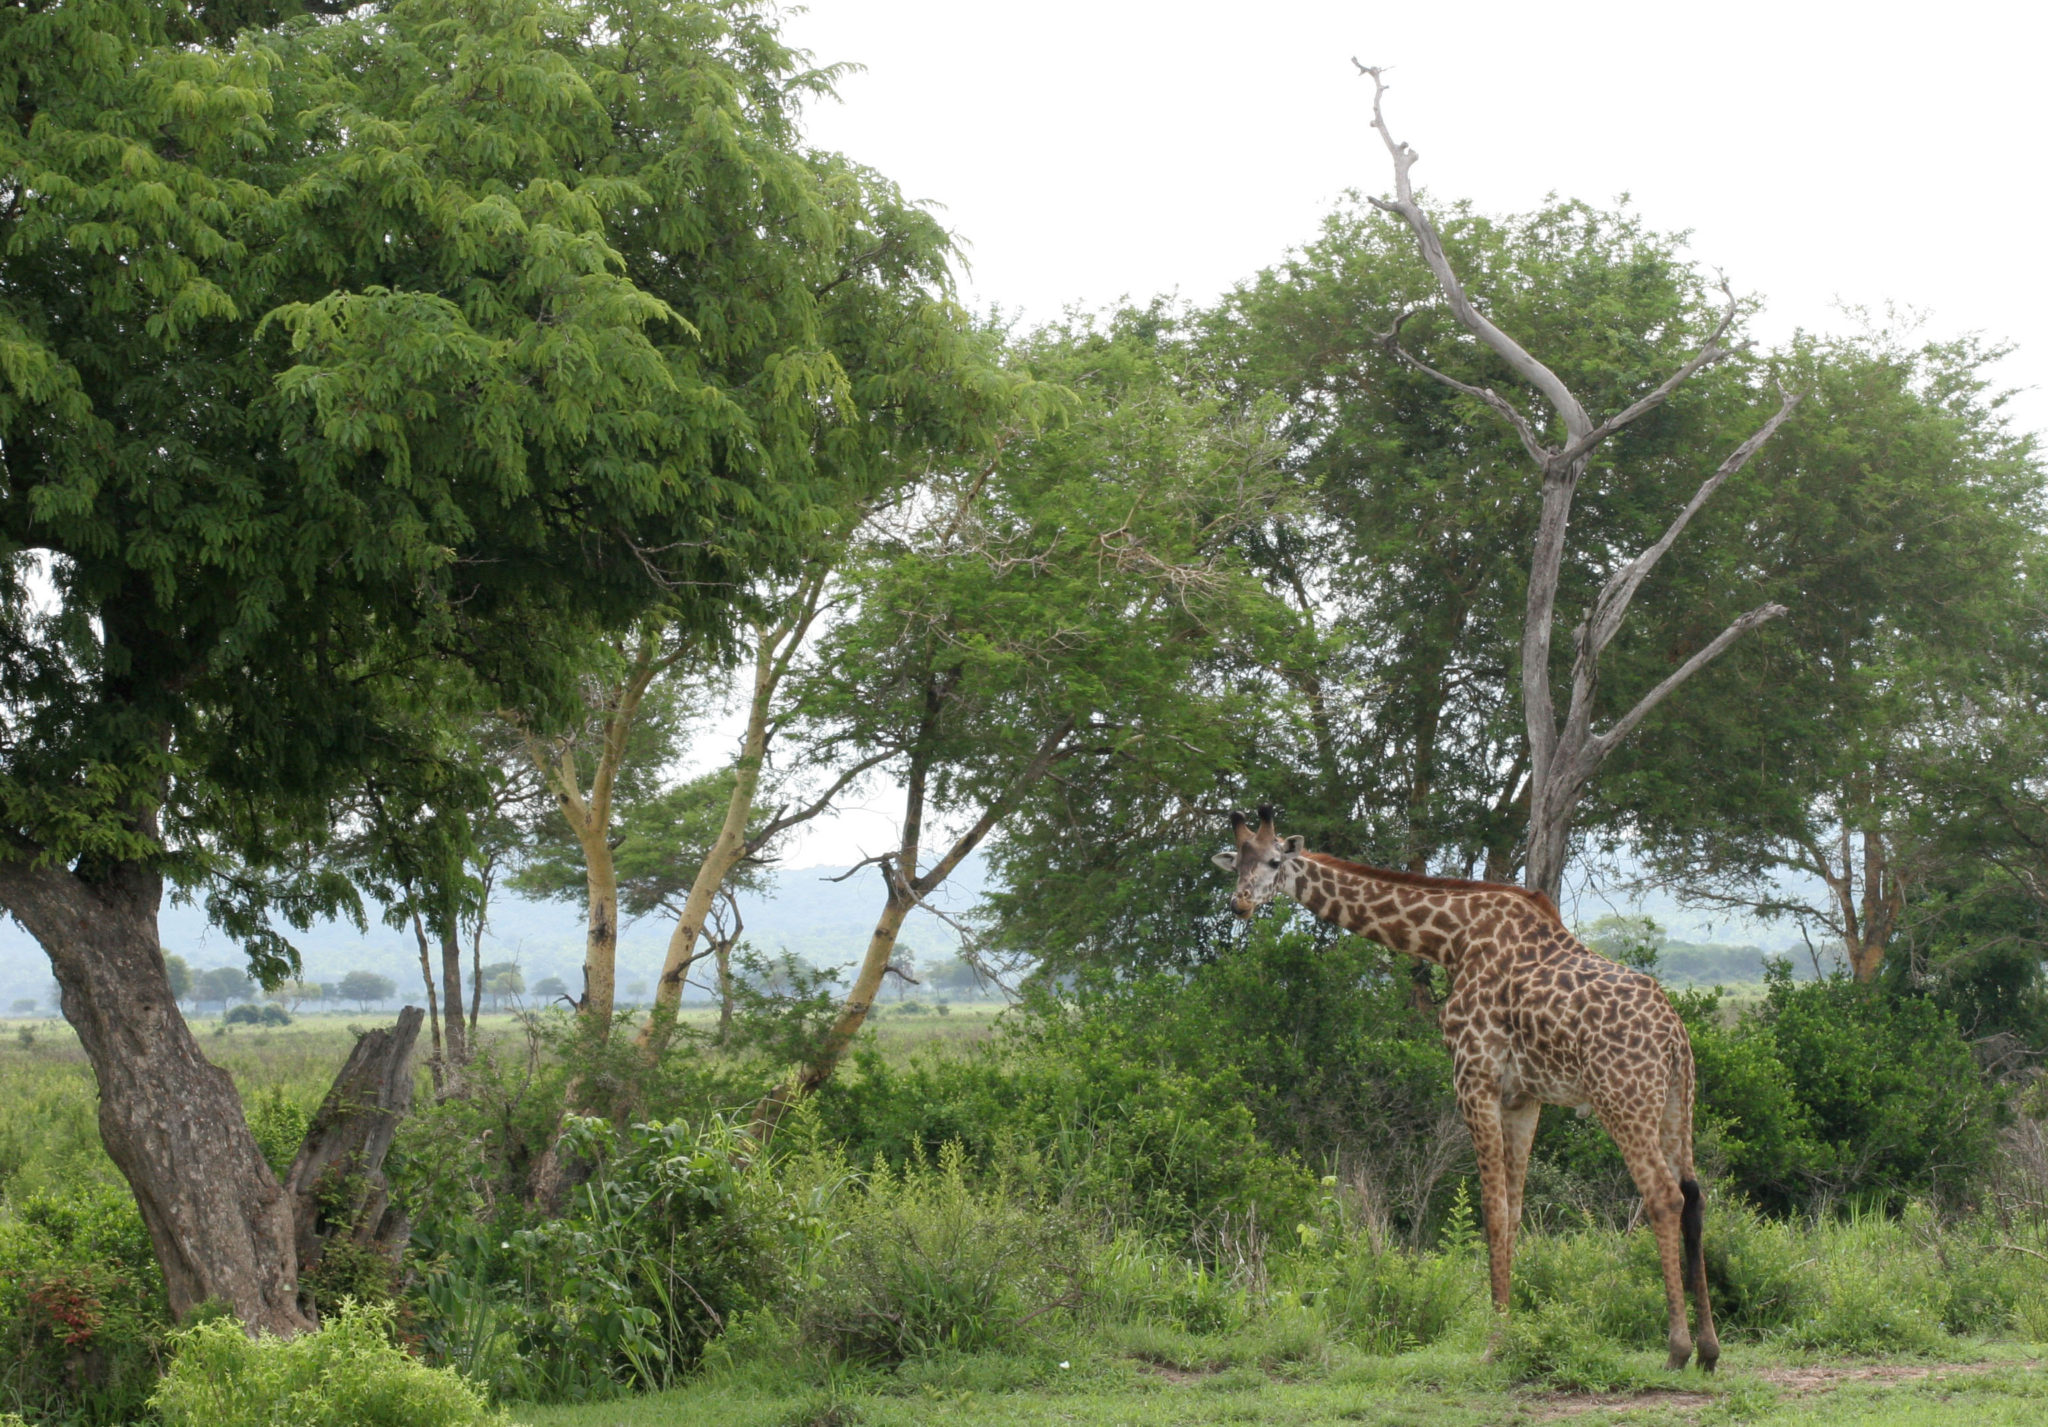 Саванна, Микуми, Танзания. Жираф. Фото Н. Вихрева